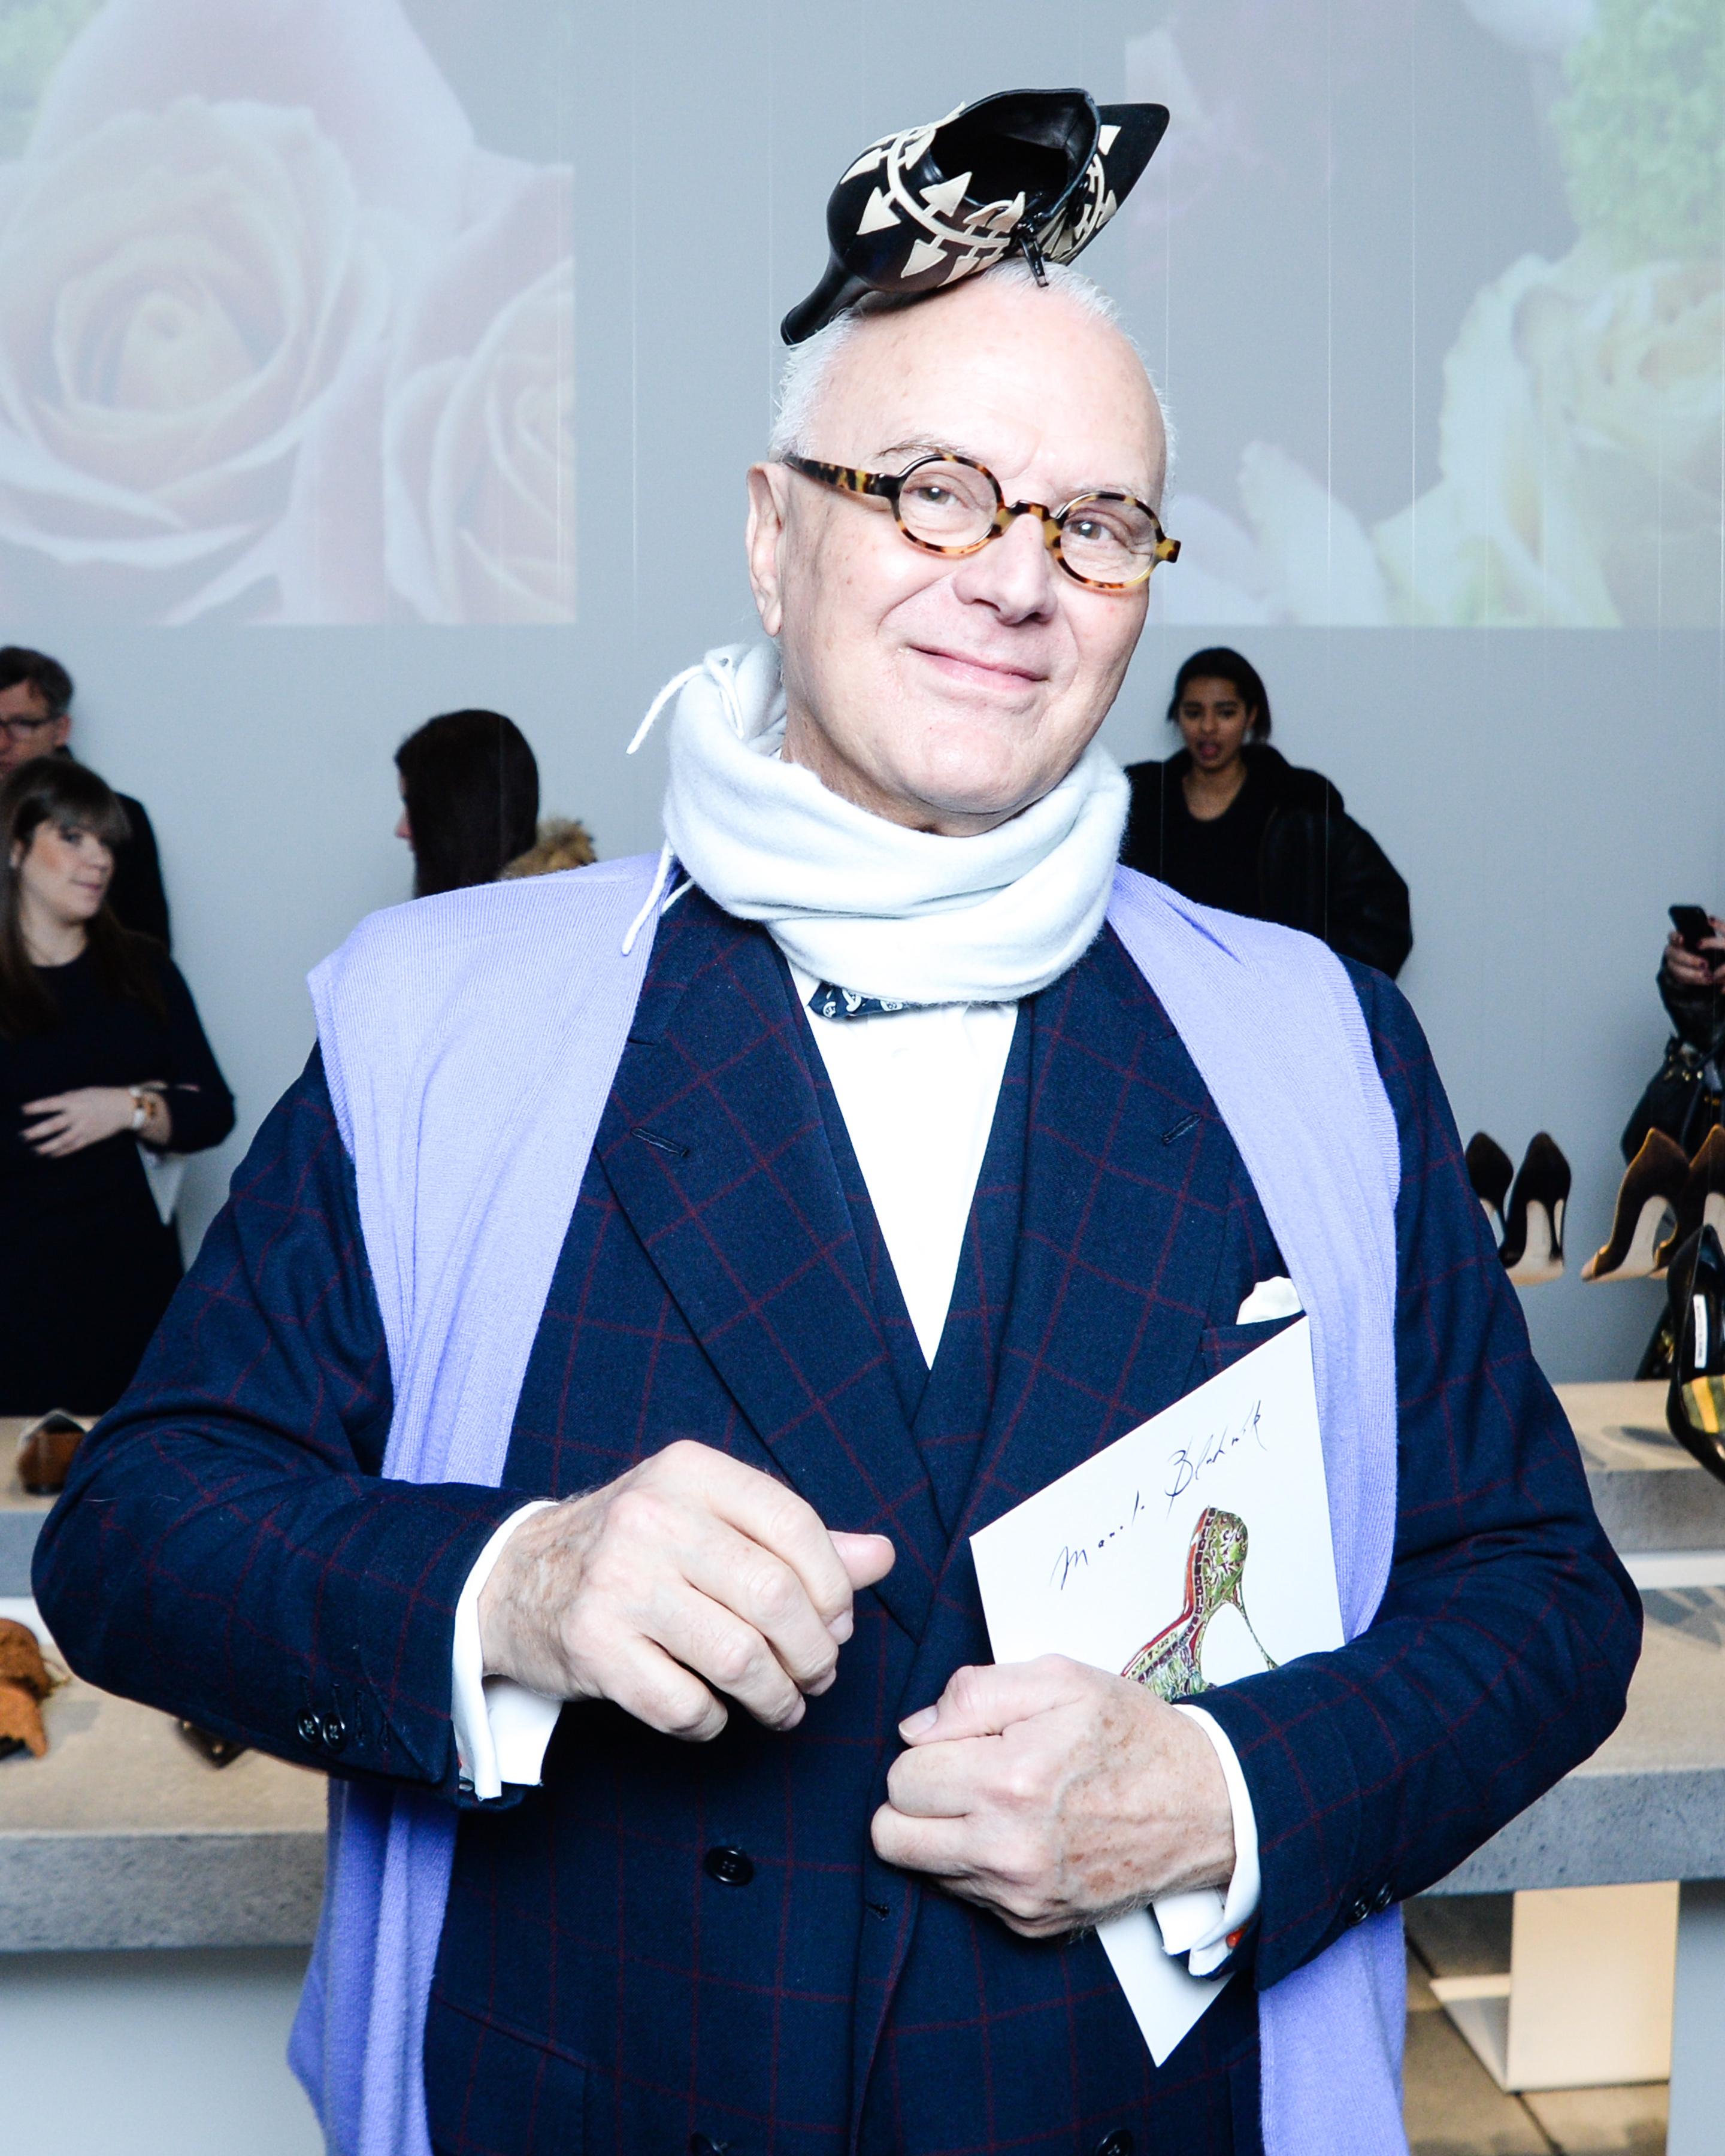 Manolo Blahnik Ivory And Black Cap Toe Guingla Diamond: Manolo Blahnik Designer